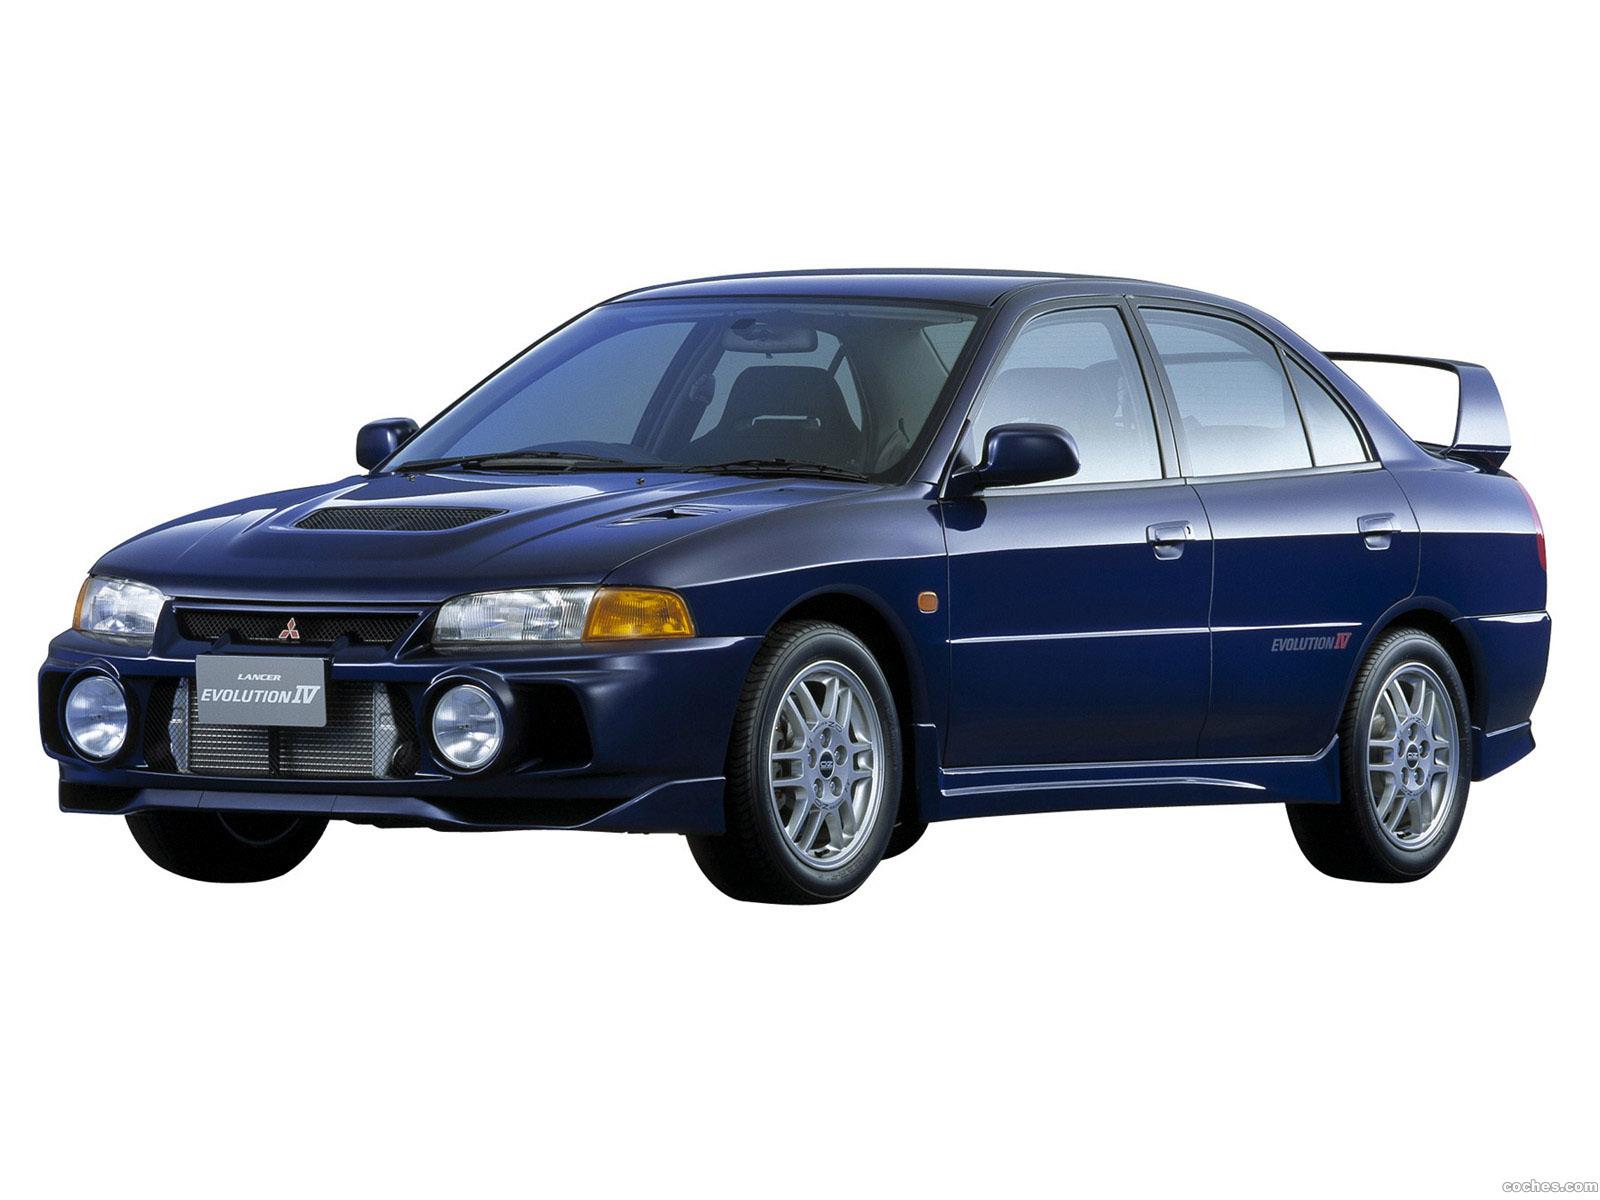 Foto 0 de Mitsubishi Lancer Evolution IV 1996